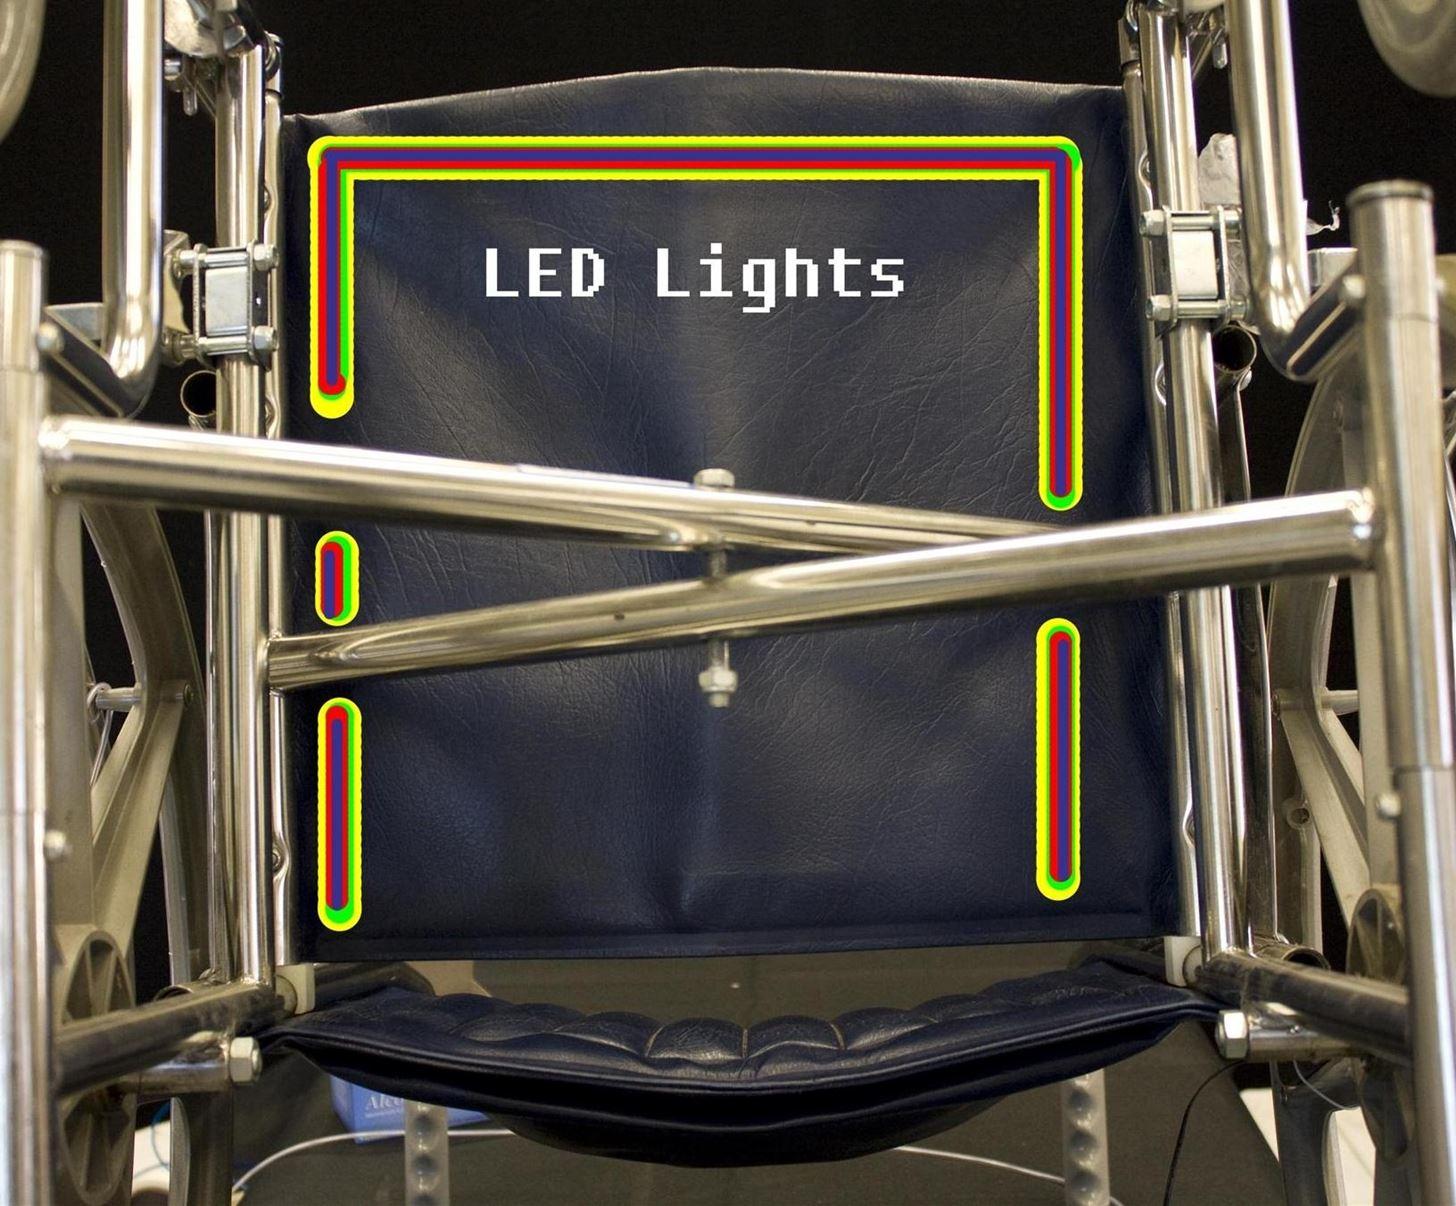 illuminate wheelchair for safety using el wire led strip.w1456?resize=665%2C551&ssl=1 ez lock wheelchair wiring diagram wiring diagram ez lock wheelchair wiring diagram at eliteediting.co